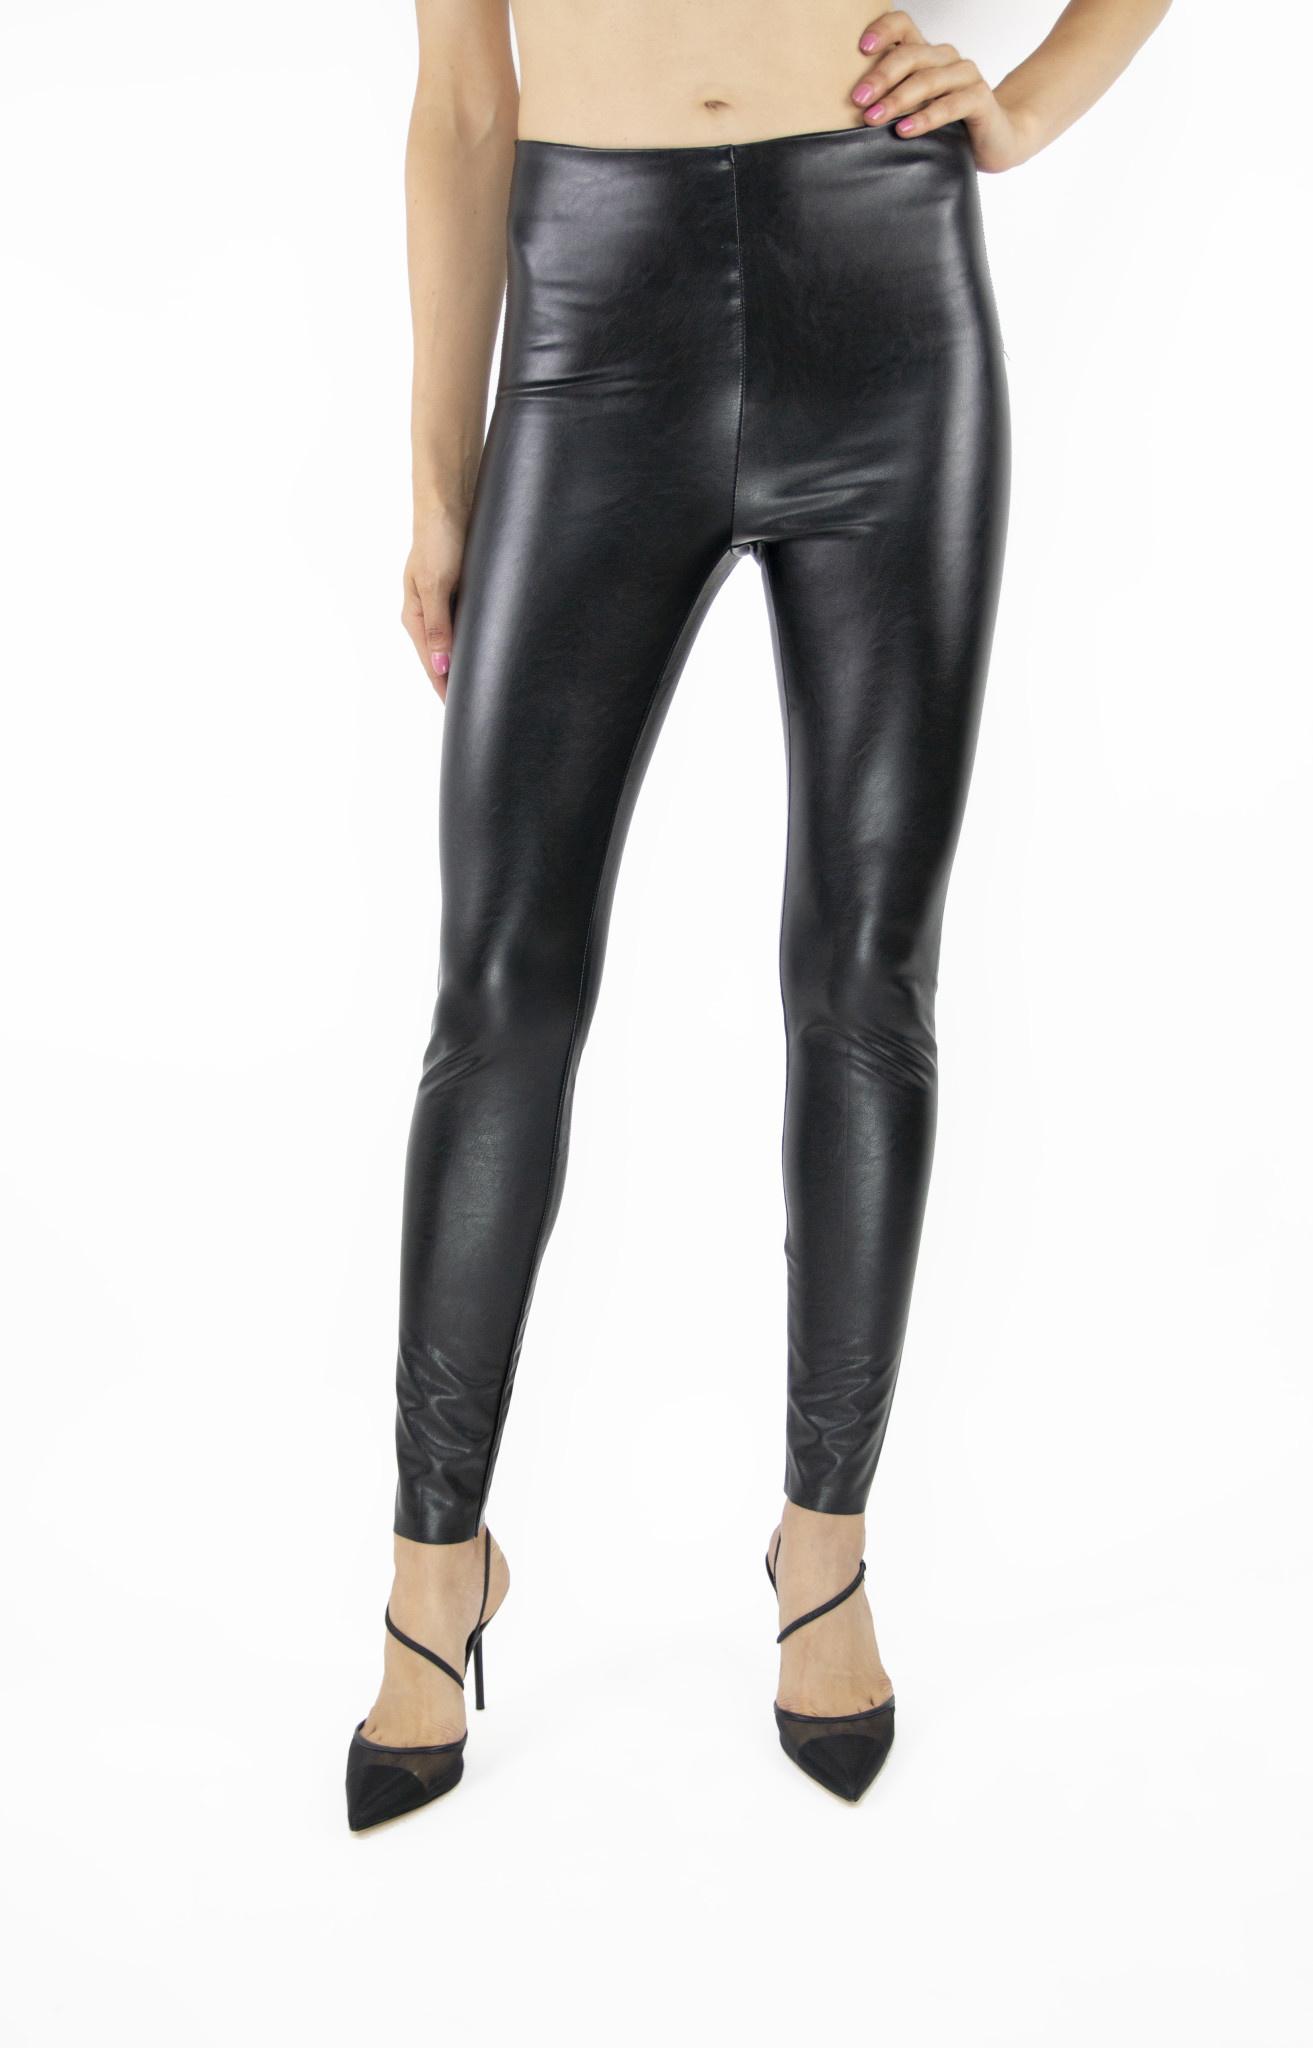 Pullon Faux Leather High Rise Leggings